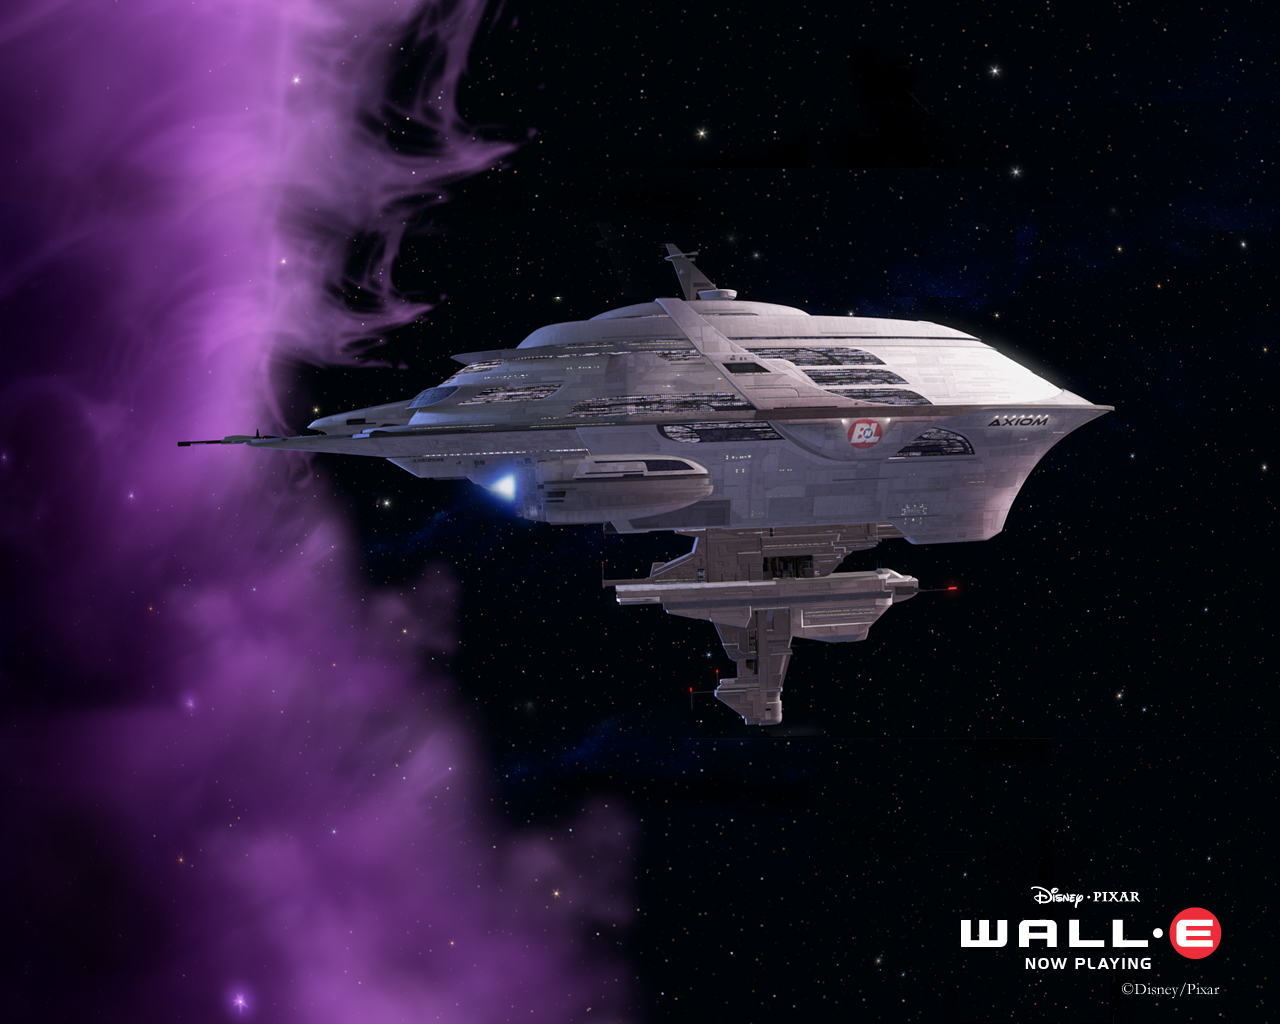 wallpaper 7 Spaceship Wallpapers 1280x1024